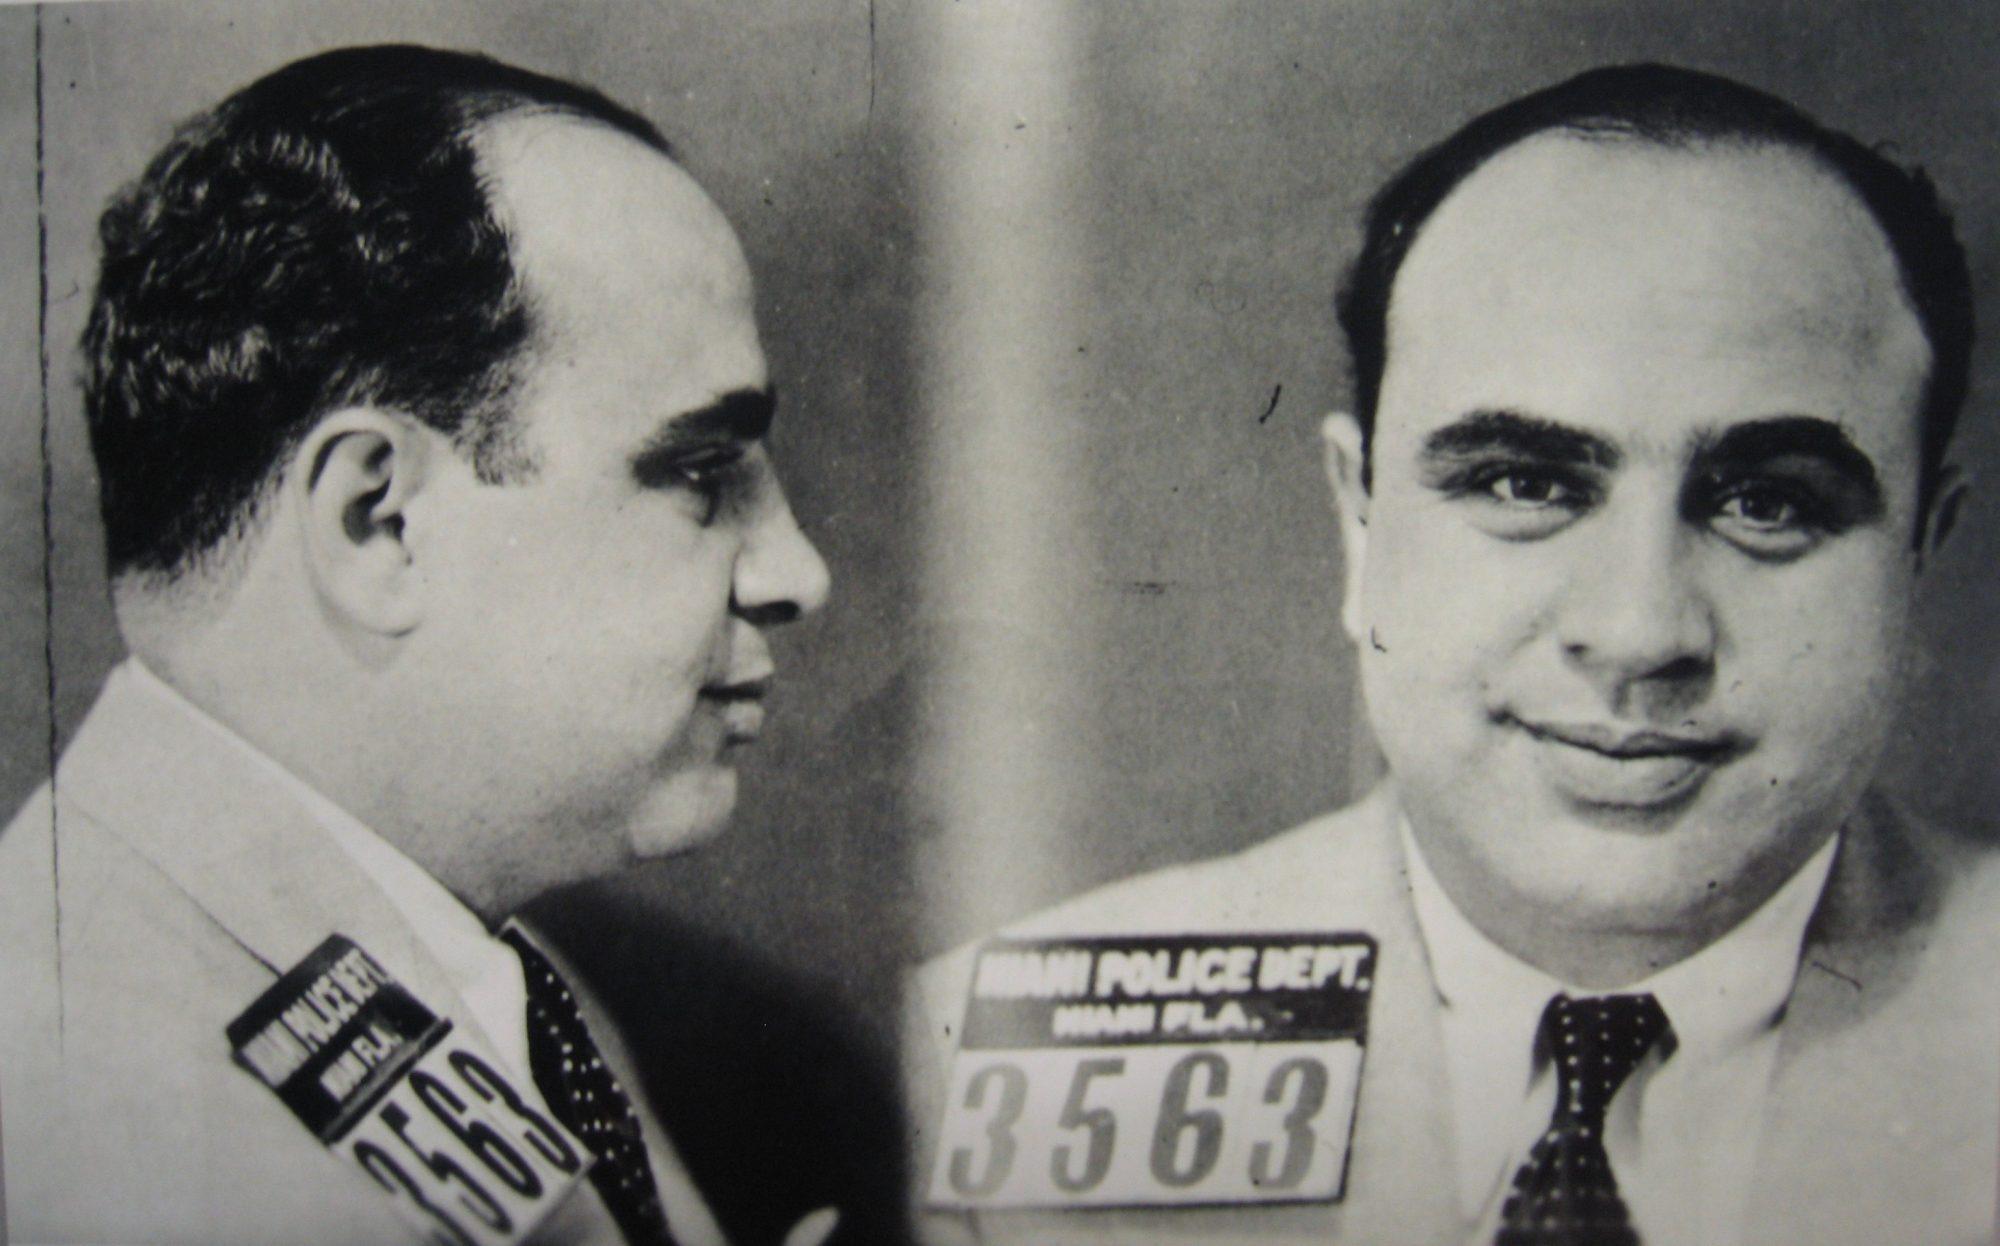 The rise of Al Capone: How UK counter-terrorism disrupts legitimate Muslim groups